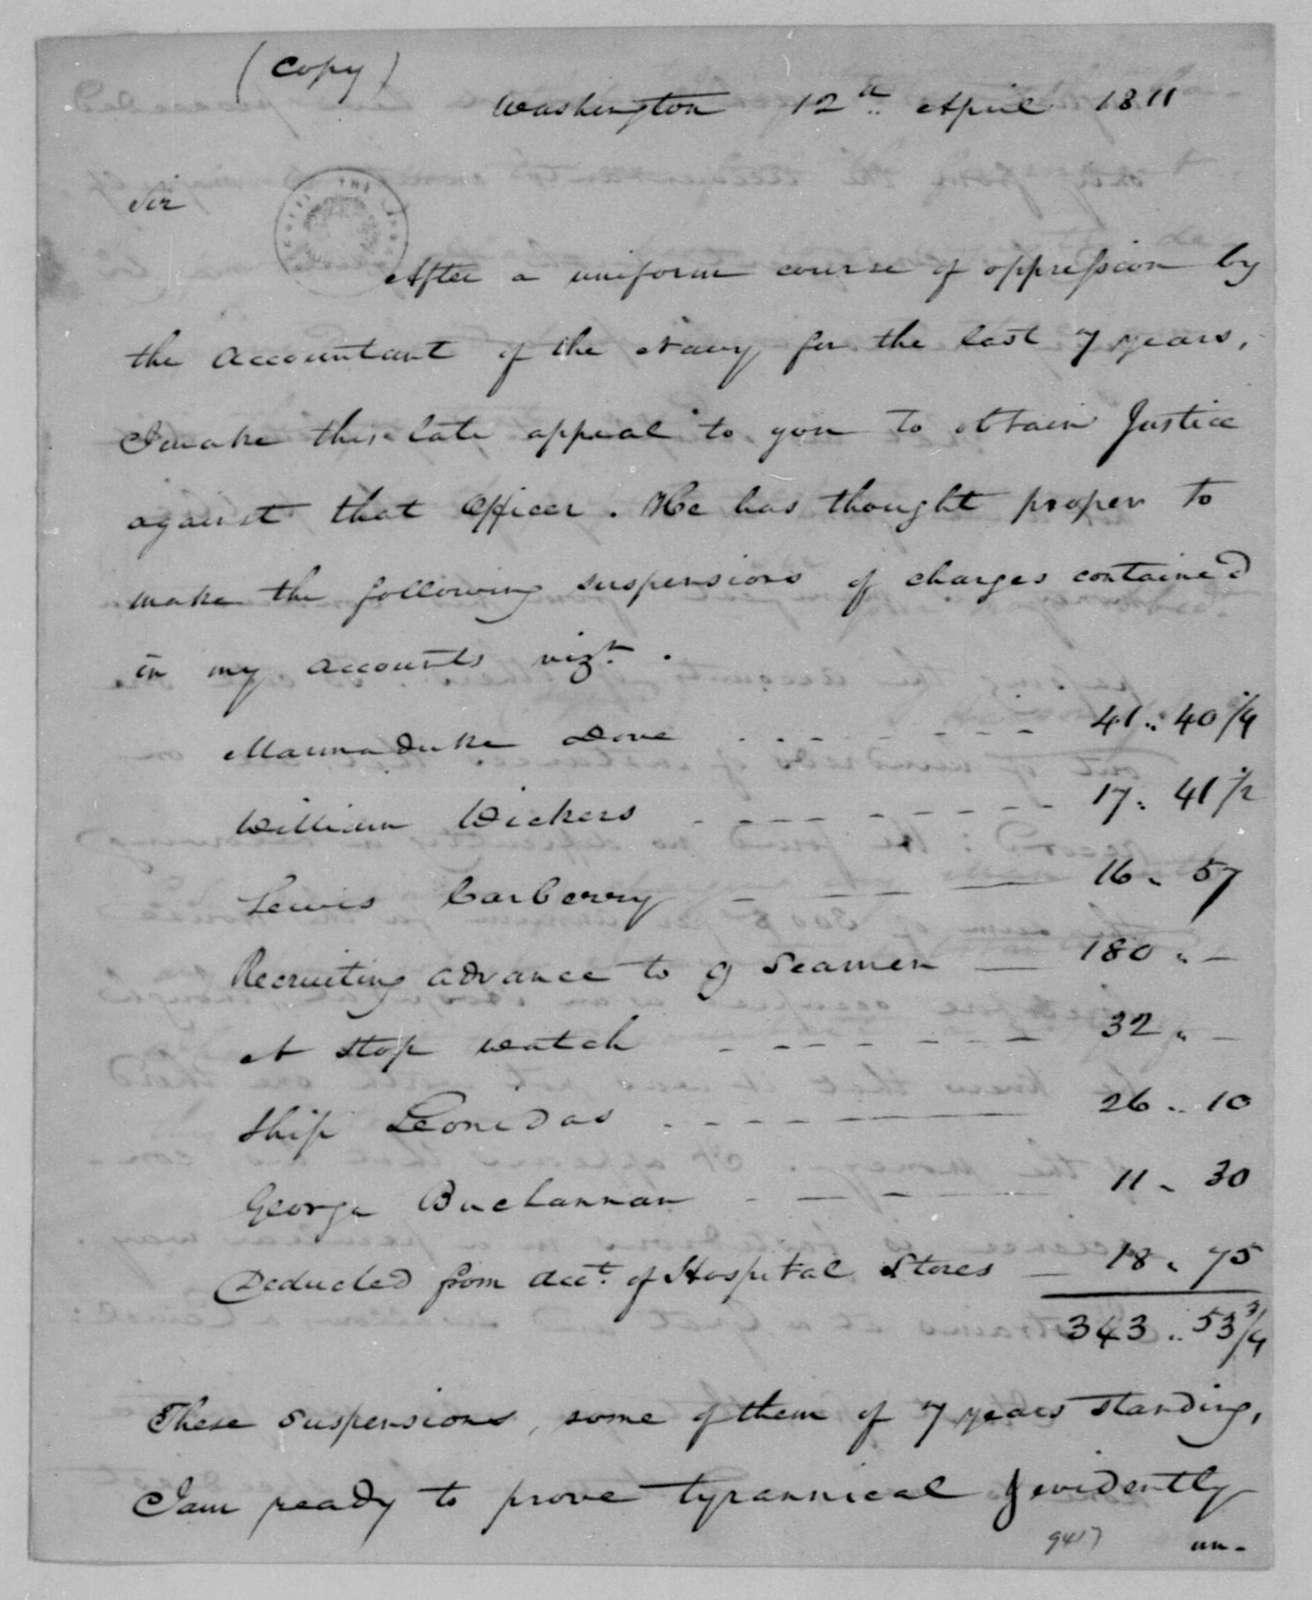 Samuel Hanson of Samuel to Gabriel Duvall, April 12, 1811.